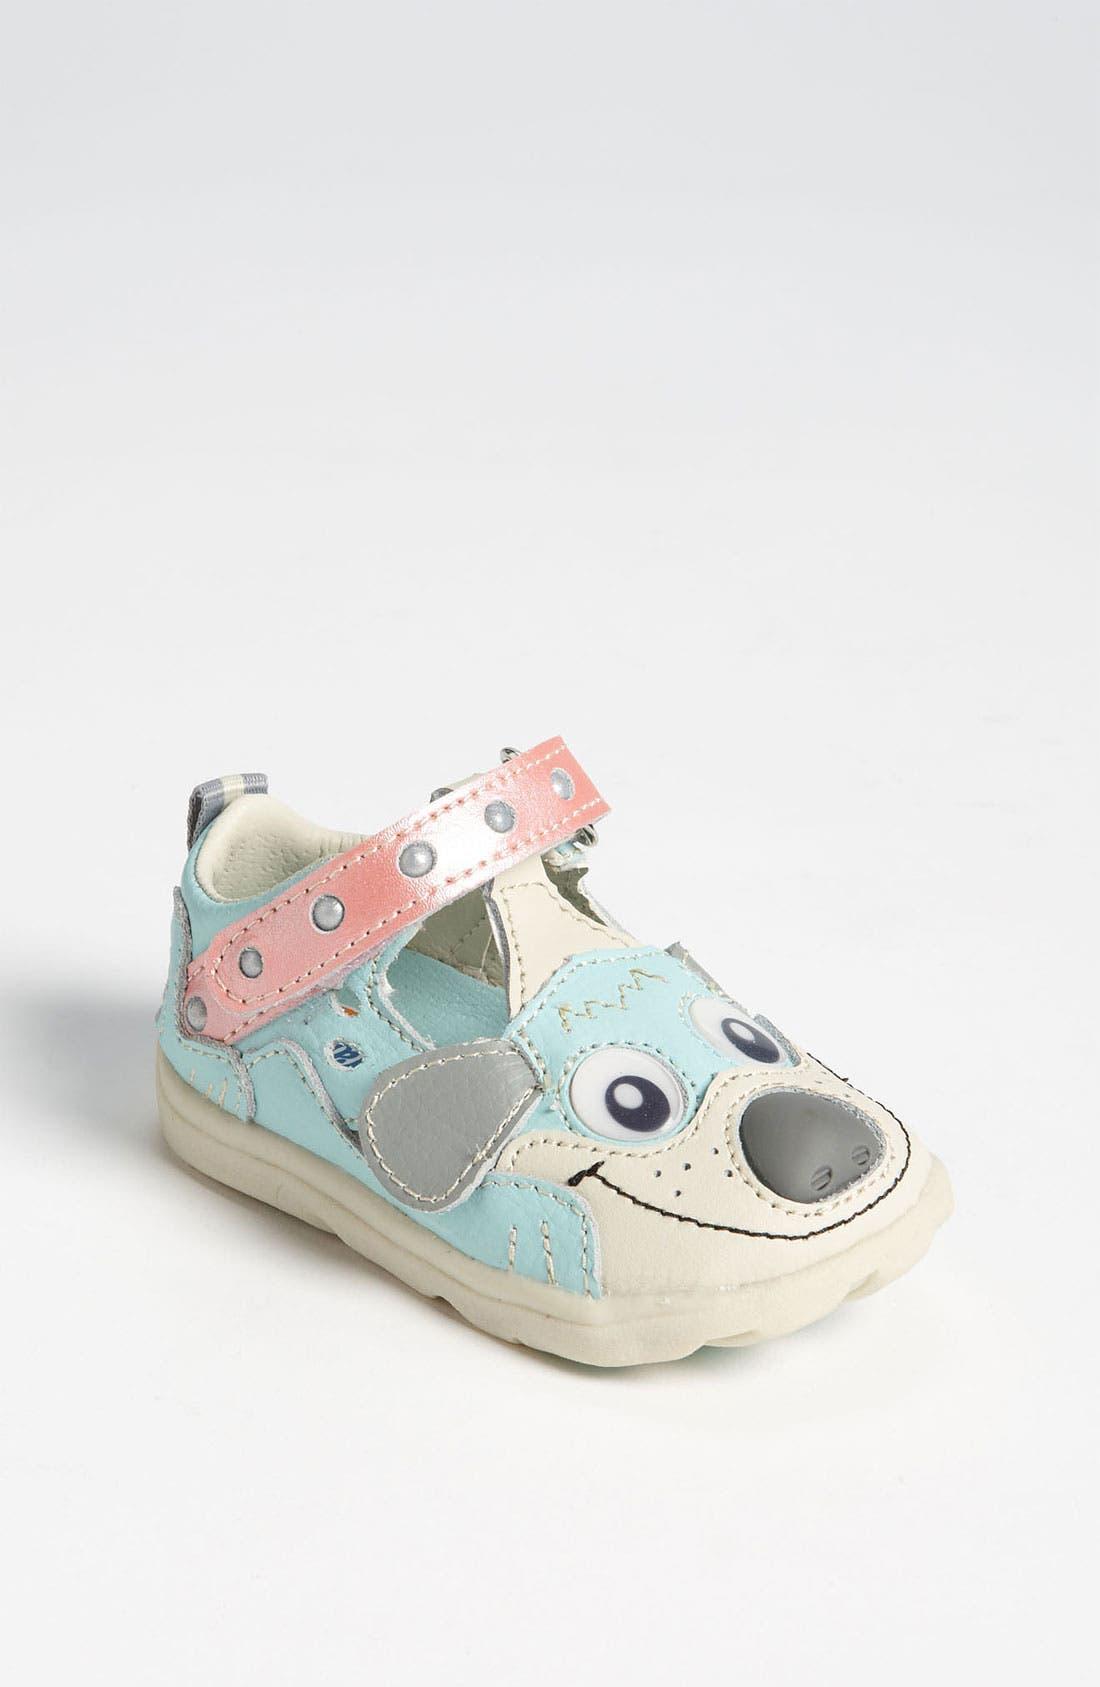 Main Image - Zooligans™ 'Puppy' Sport Sandal (Baby, Walker & Toddler)